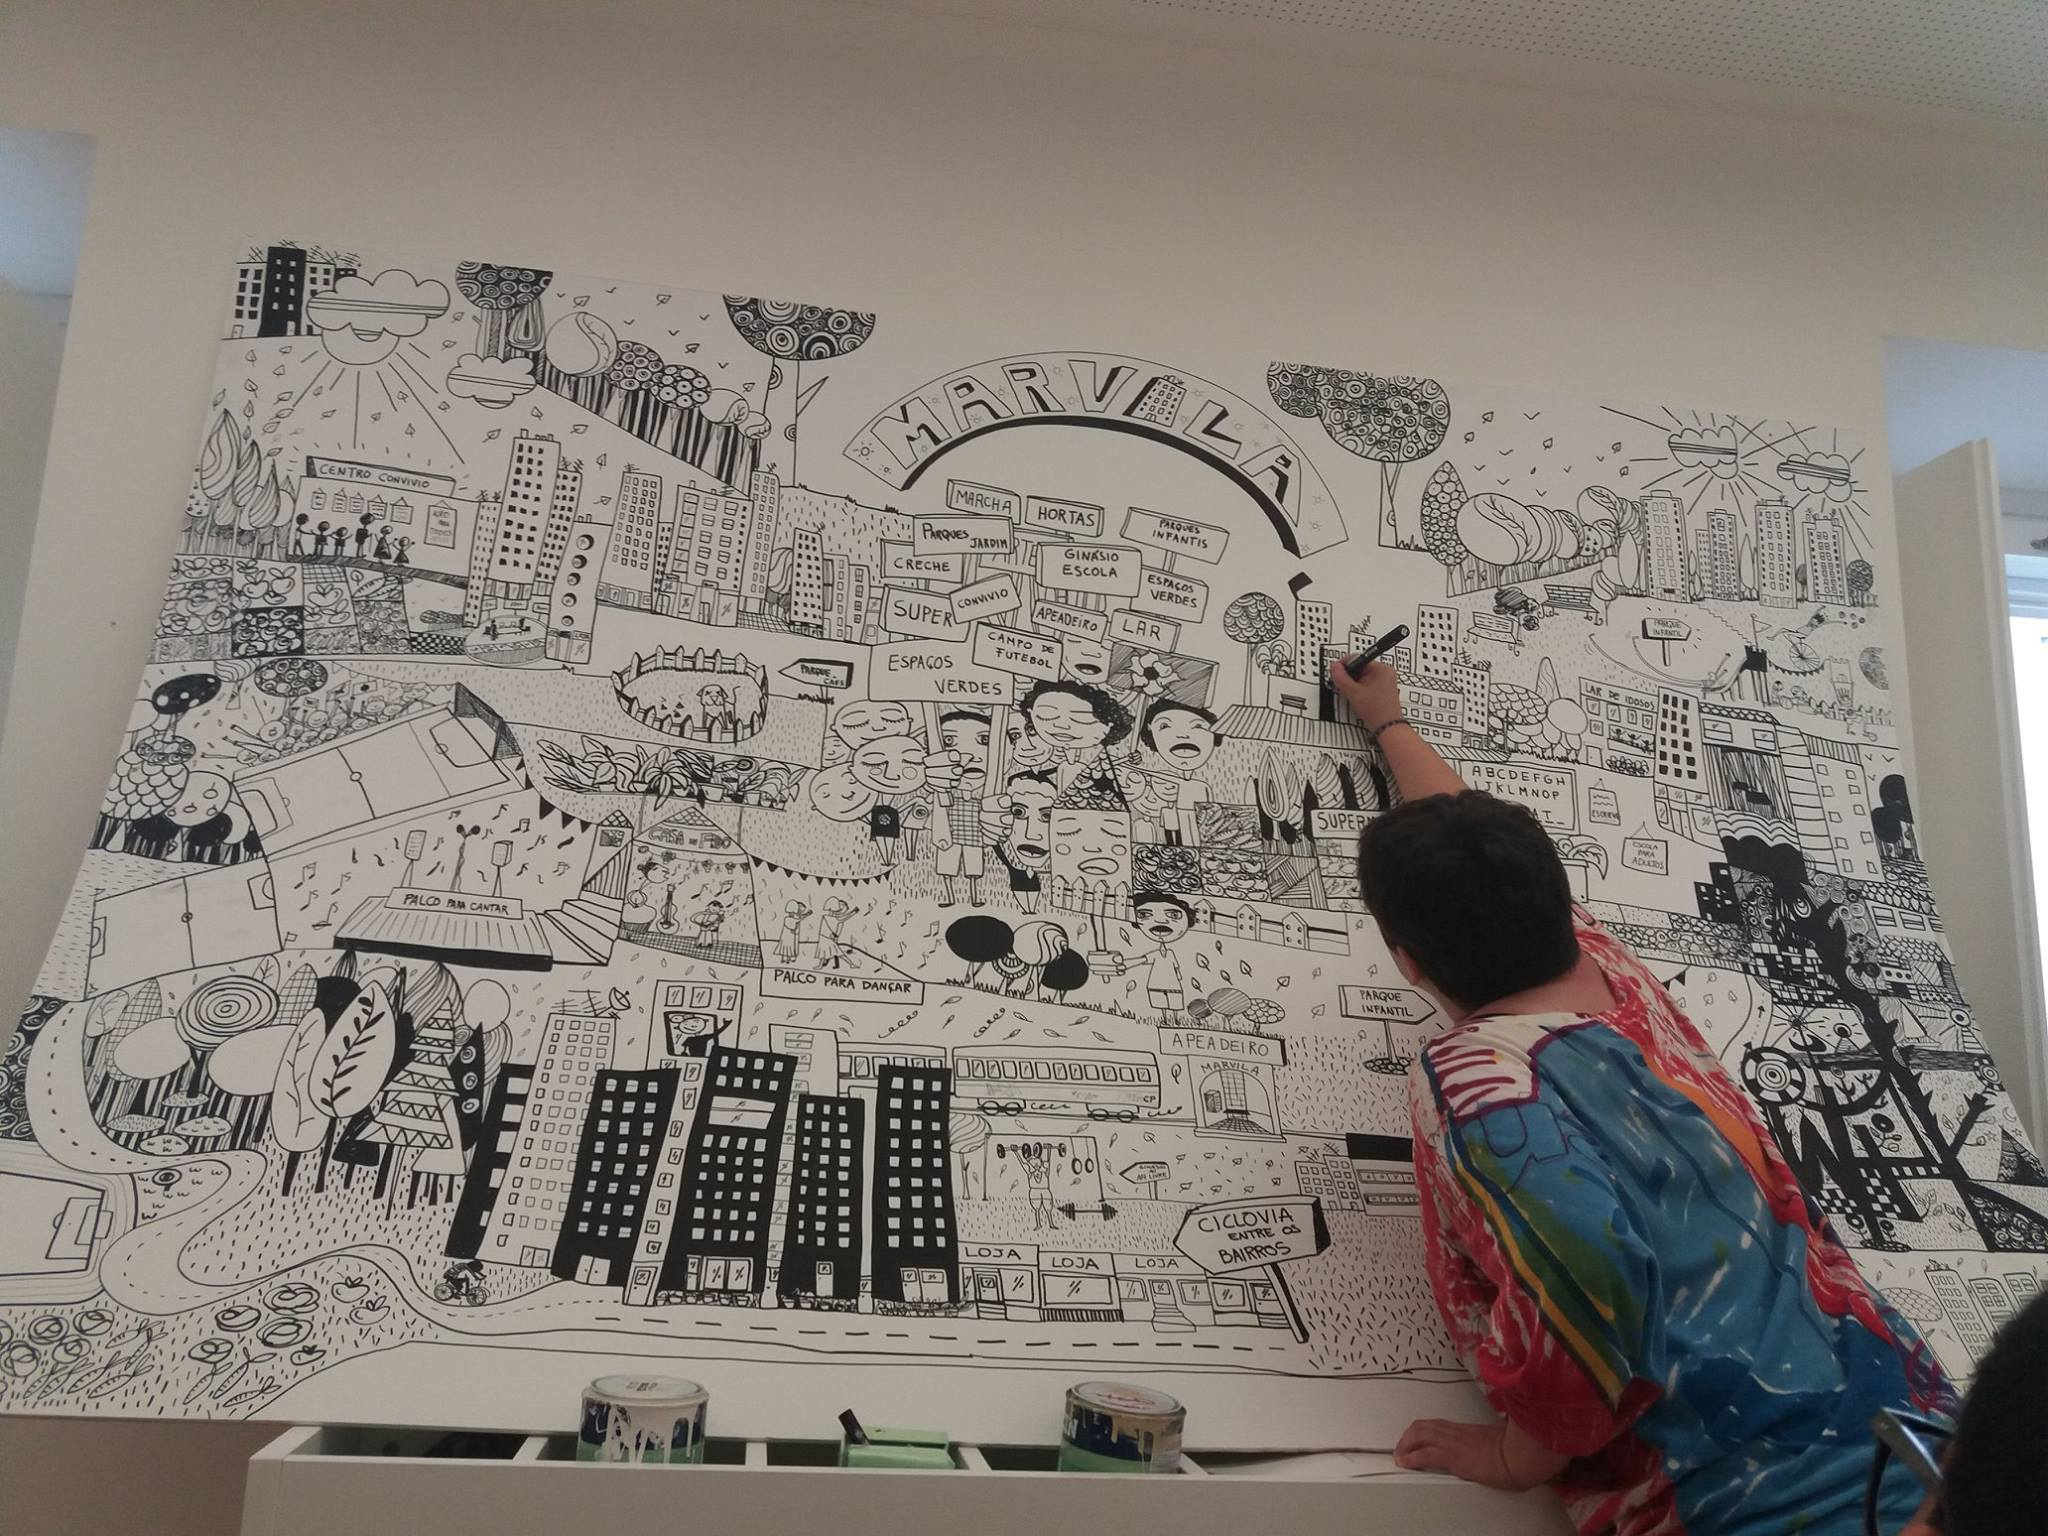 Mural dos Desejos